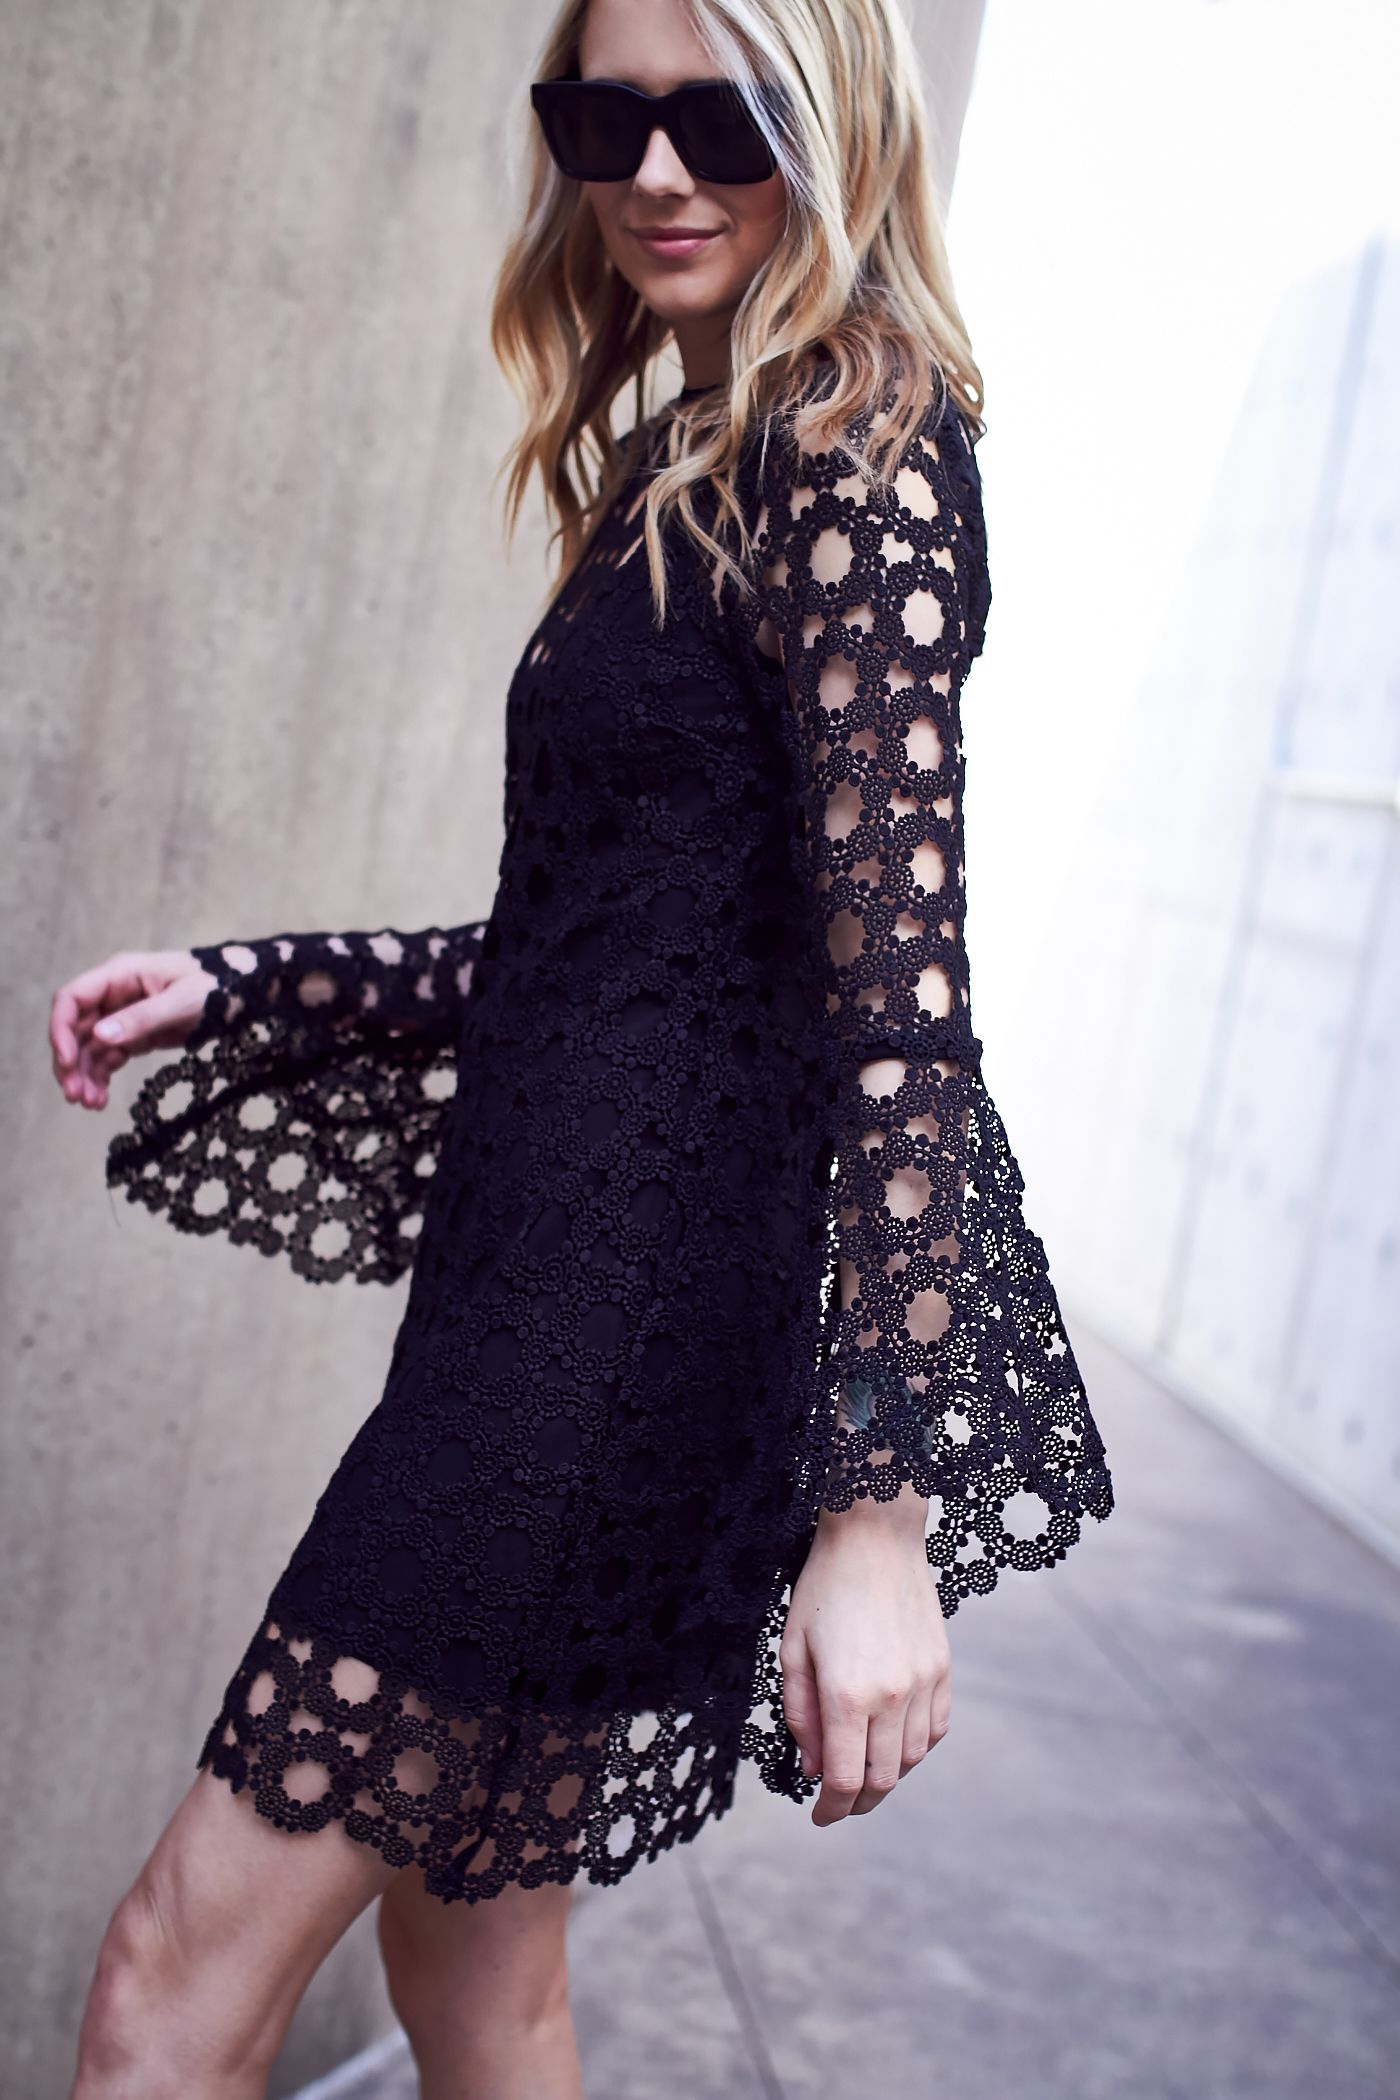 374b51693ccb N/Nicholas Lace Overlay Long Sleeve Black Mini Dress, Black Celine  Sunglasses, Christian Louboutin Pigalle Plato Black Pumps